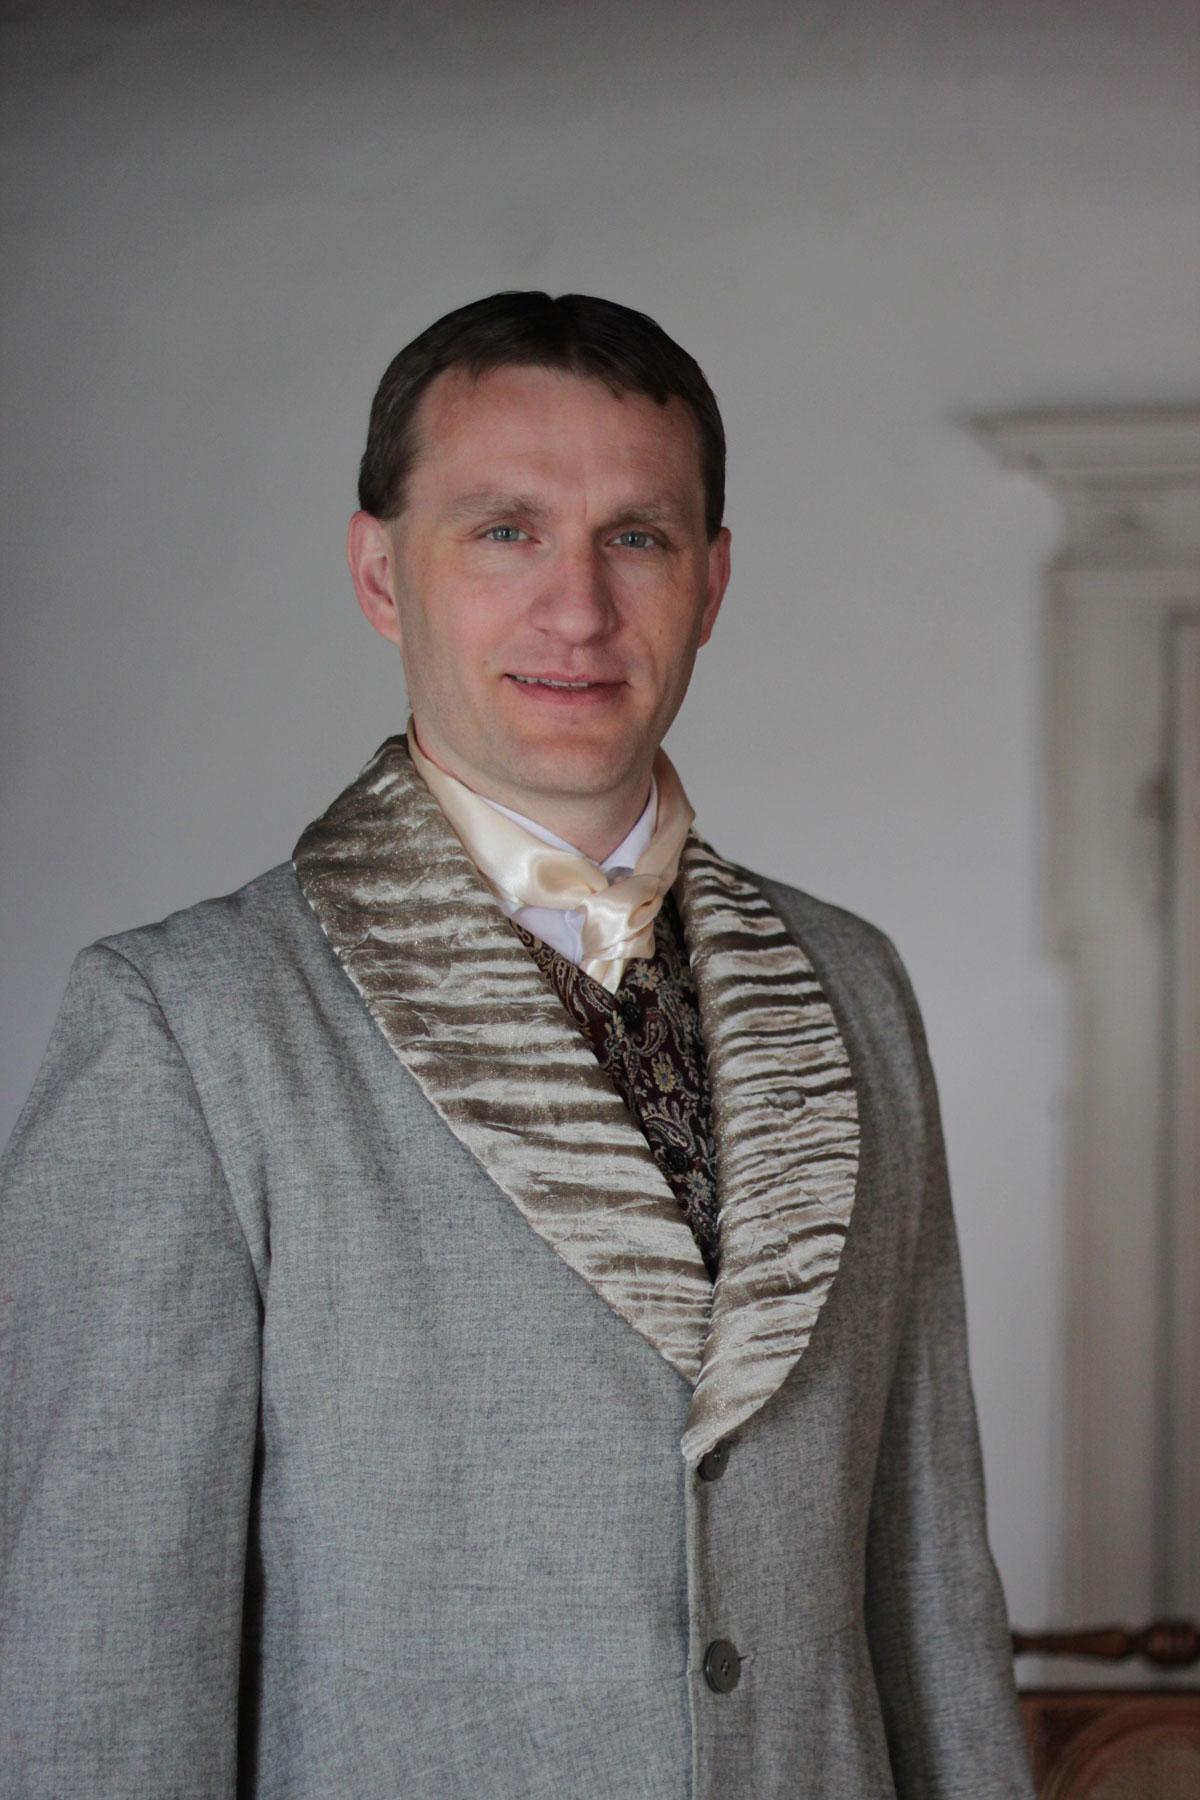 Dr. Rothenbuchner